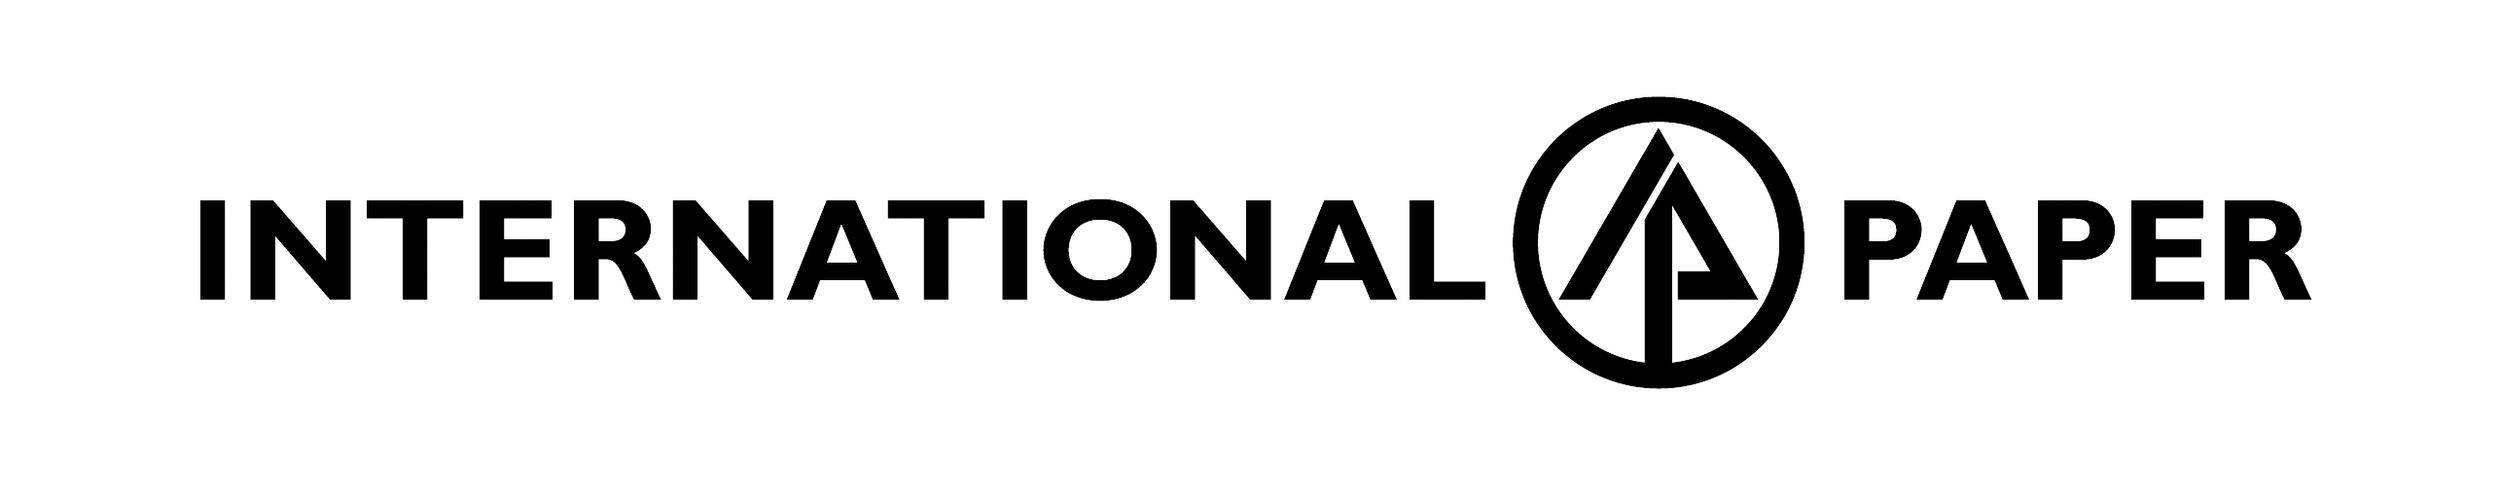 logo international paper.jpg